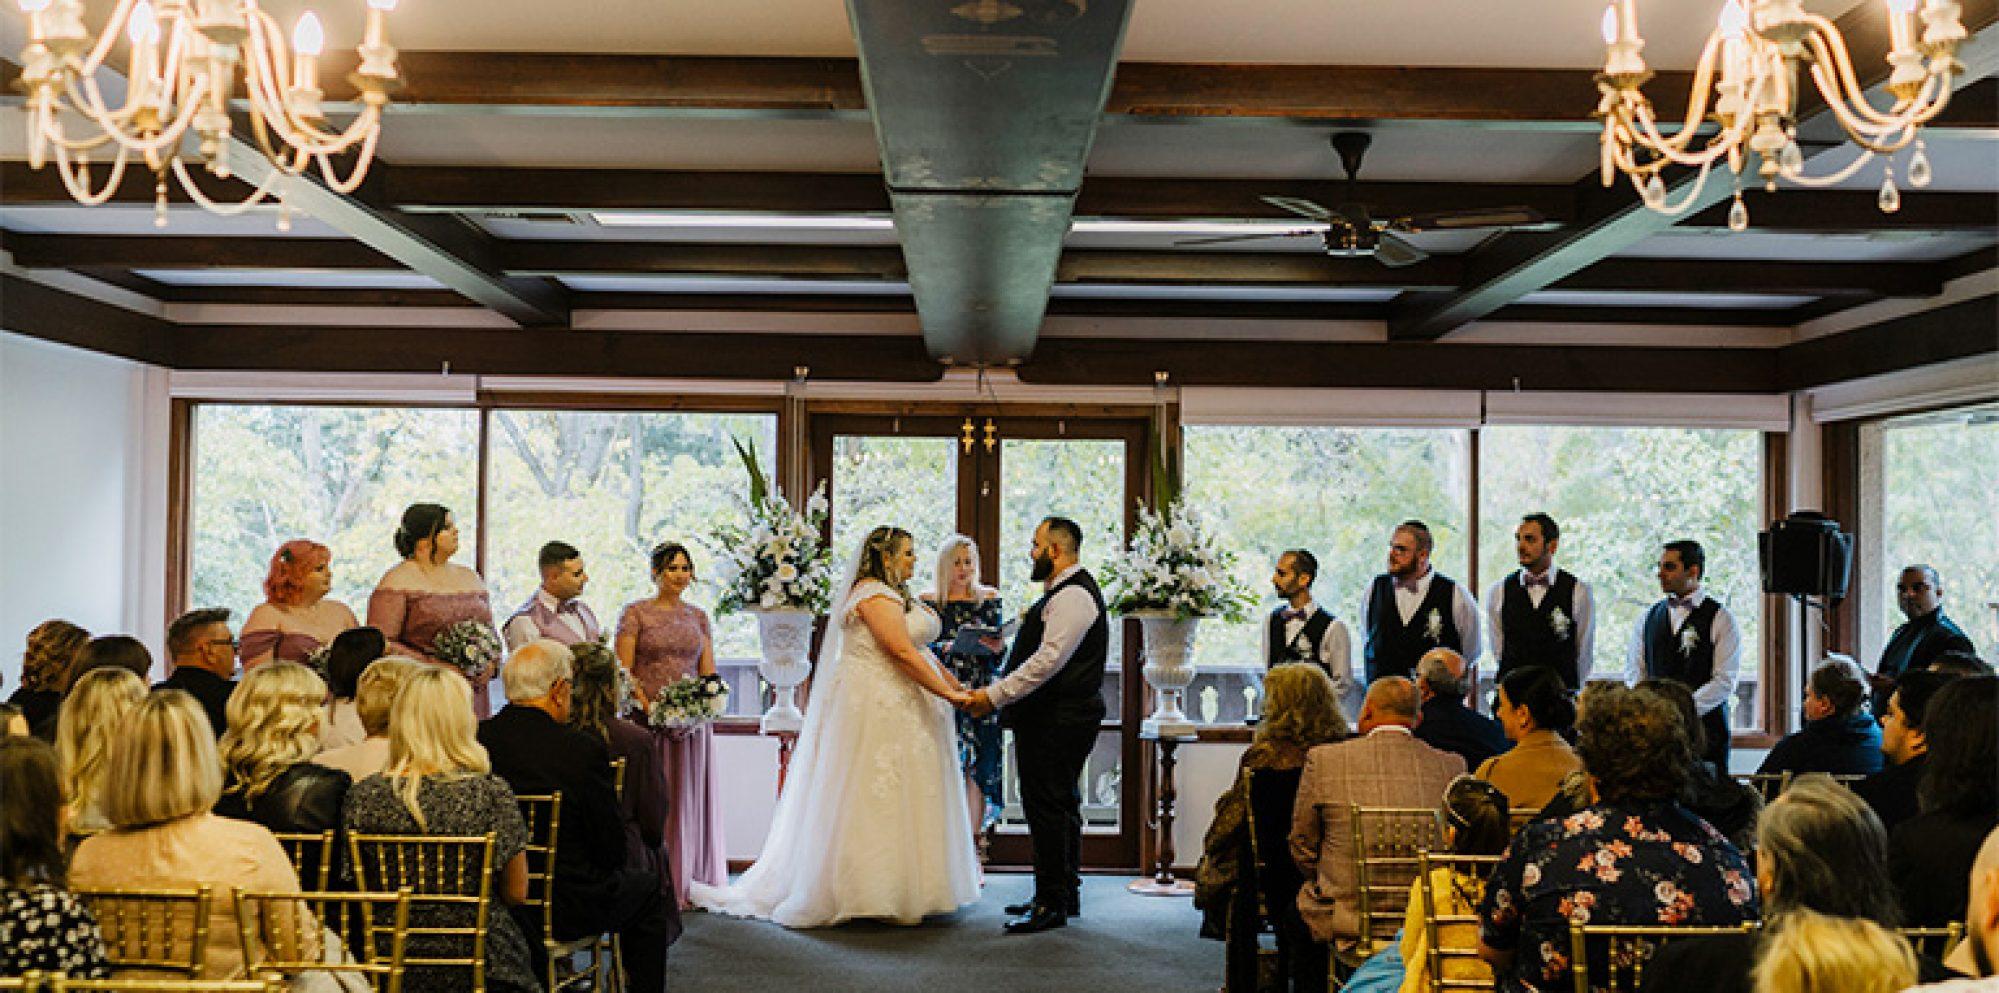 Sarah & mark wedding photography @ chateau wyuna